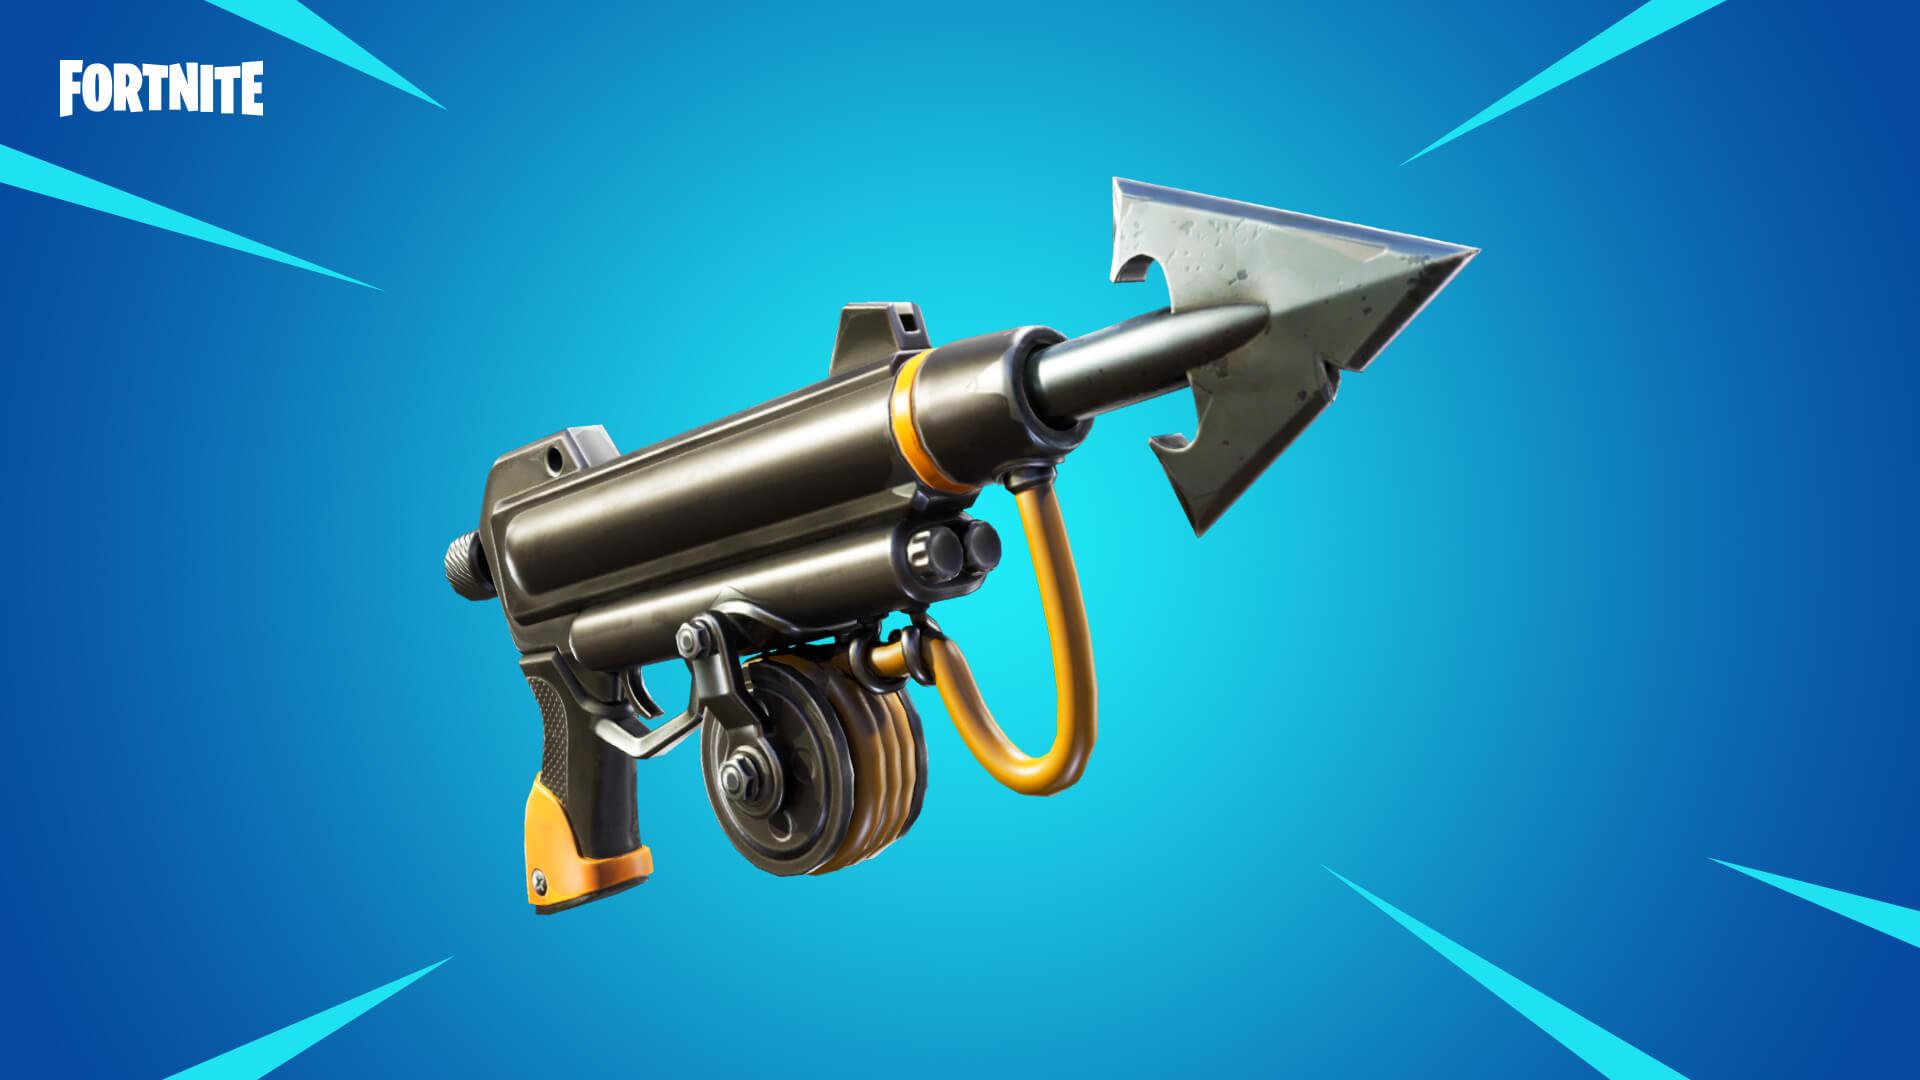 The Fortnite Harpoon Gun